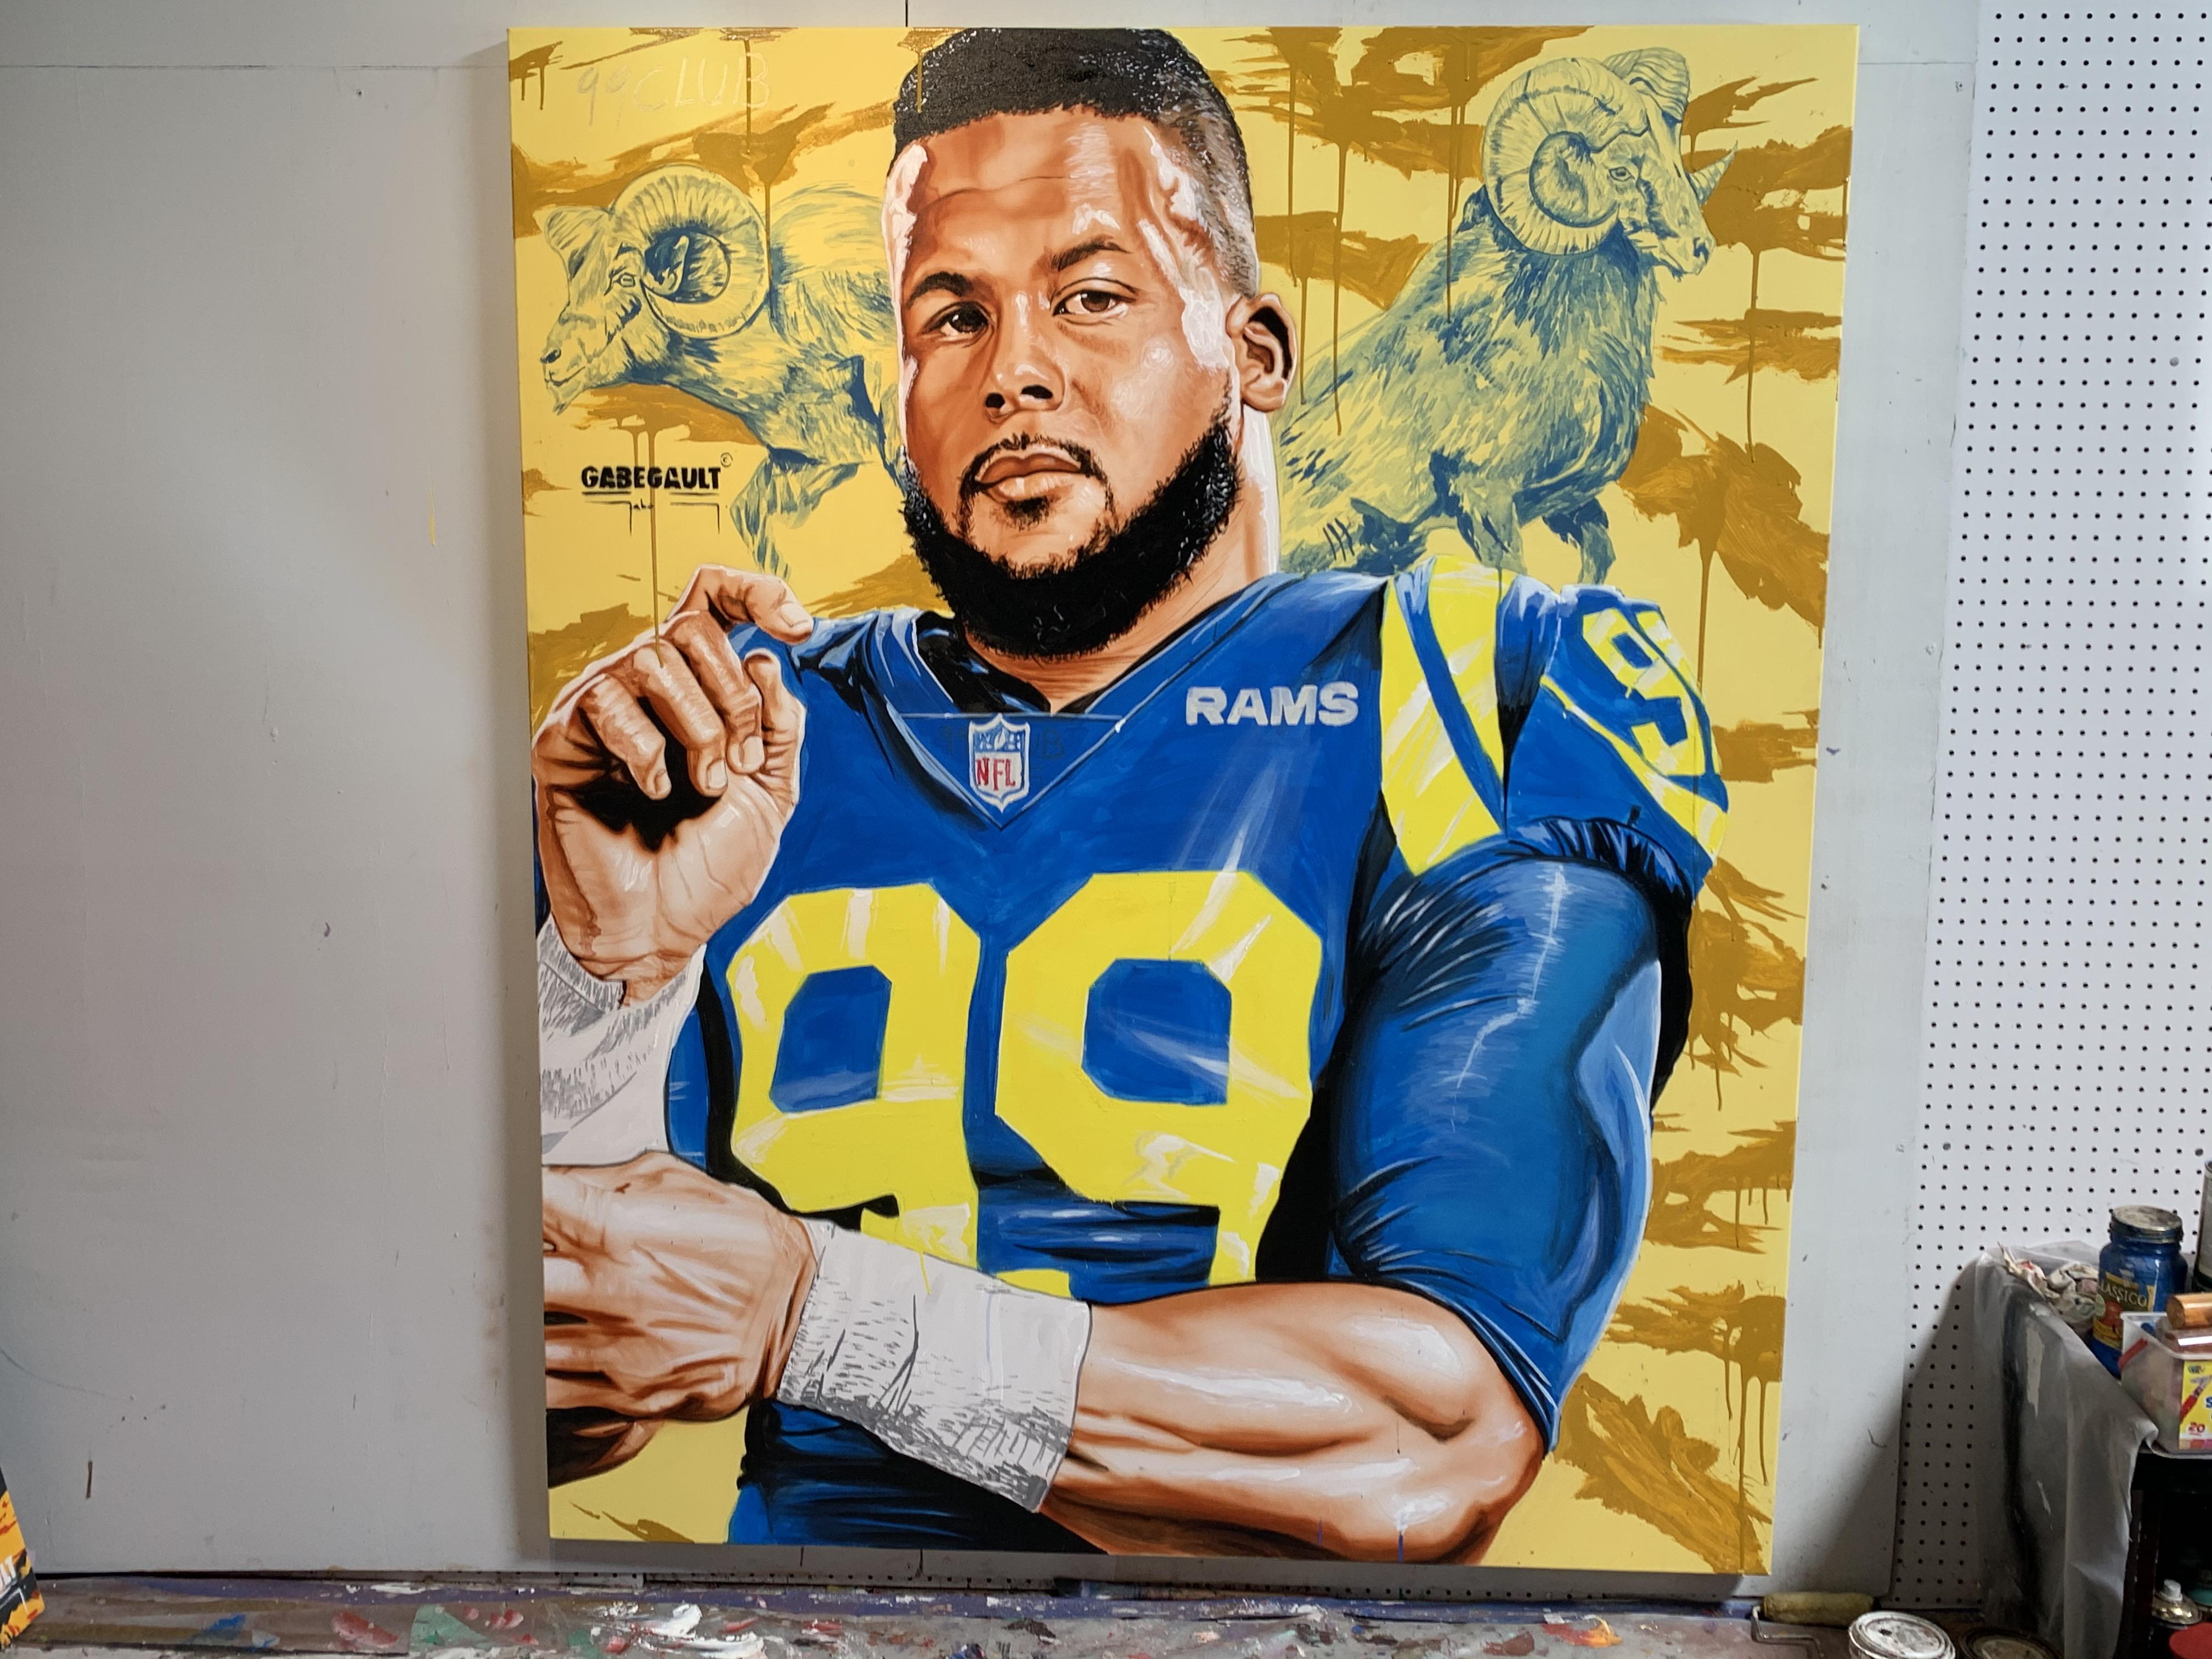 LA Rams' Aaron Donald Joins Madden NFL 21's 99 Club